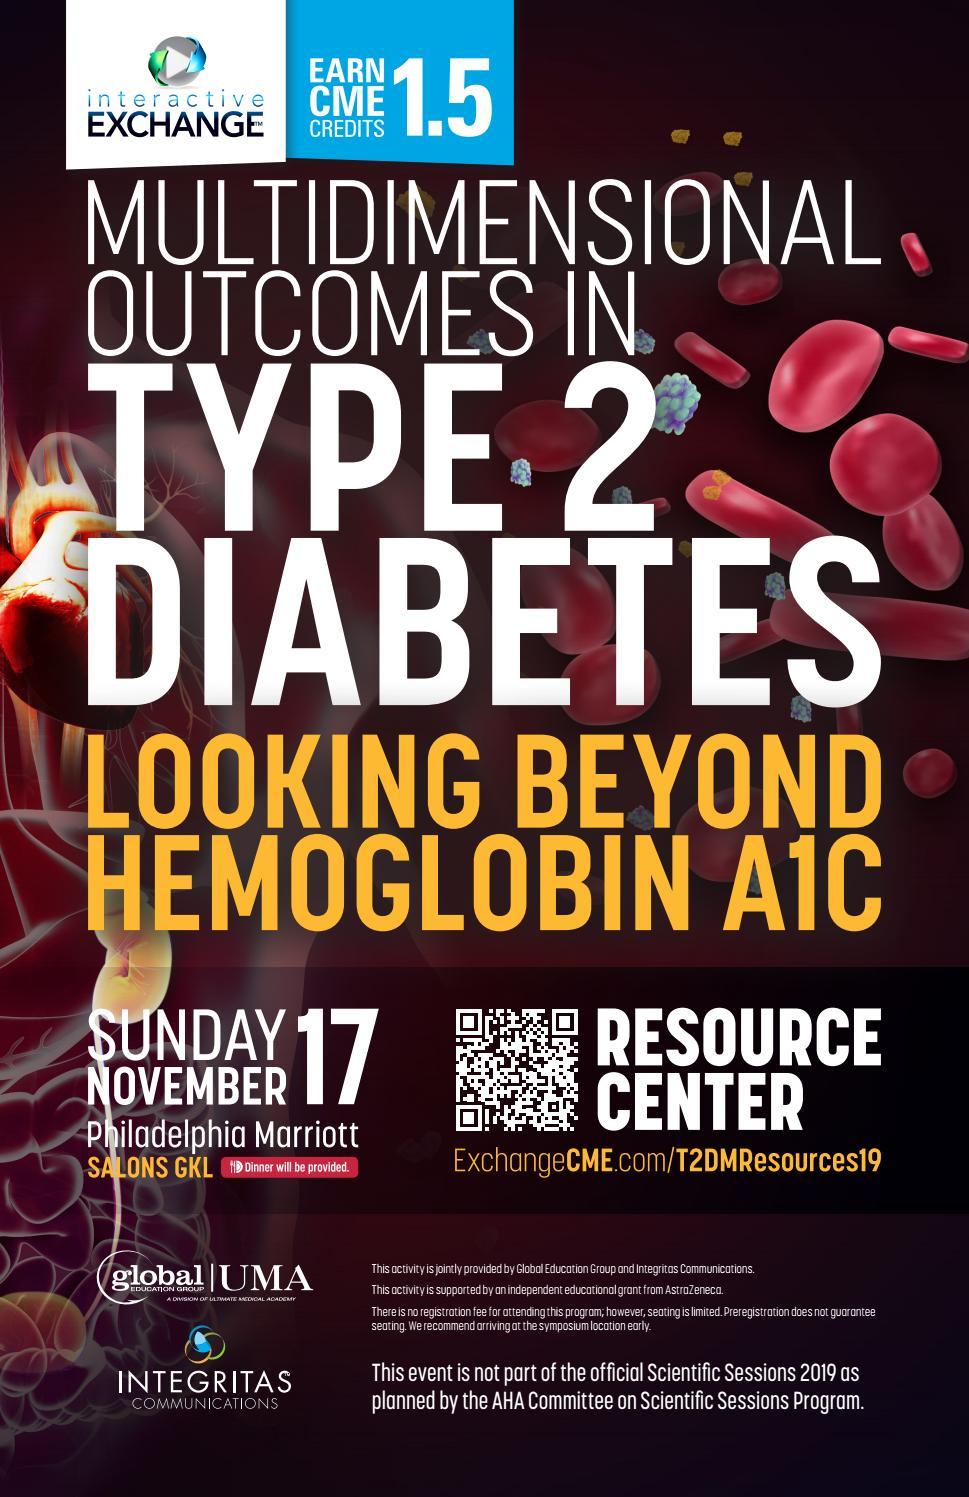 división de diabetes sanofi aventis